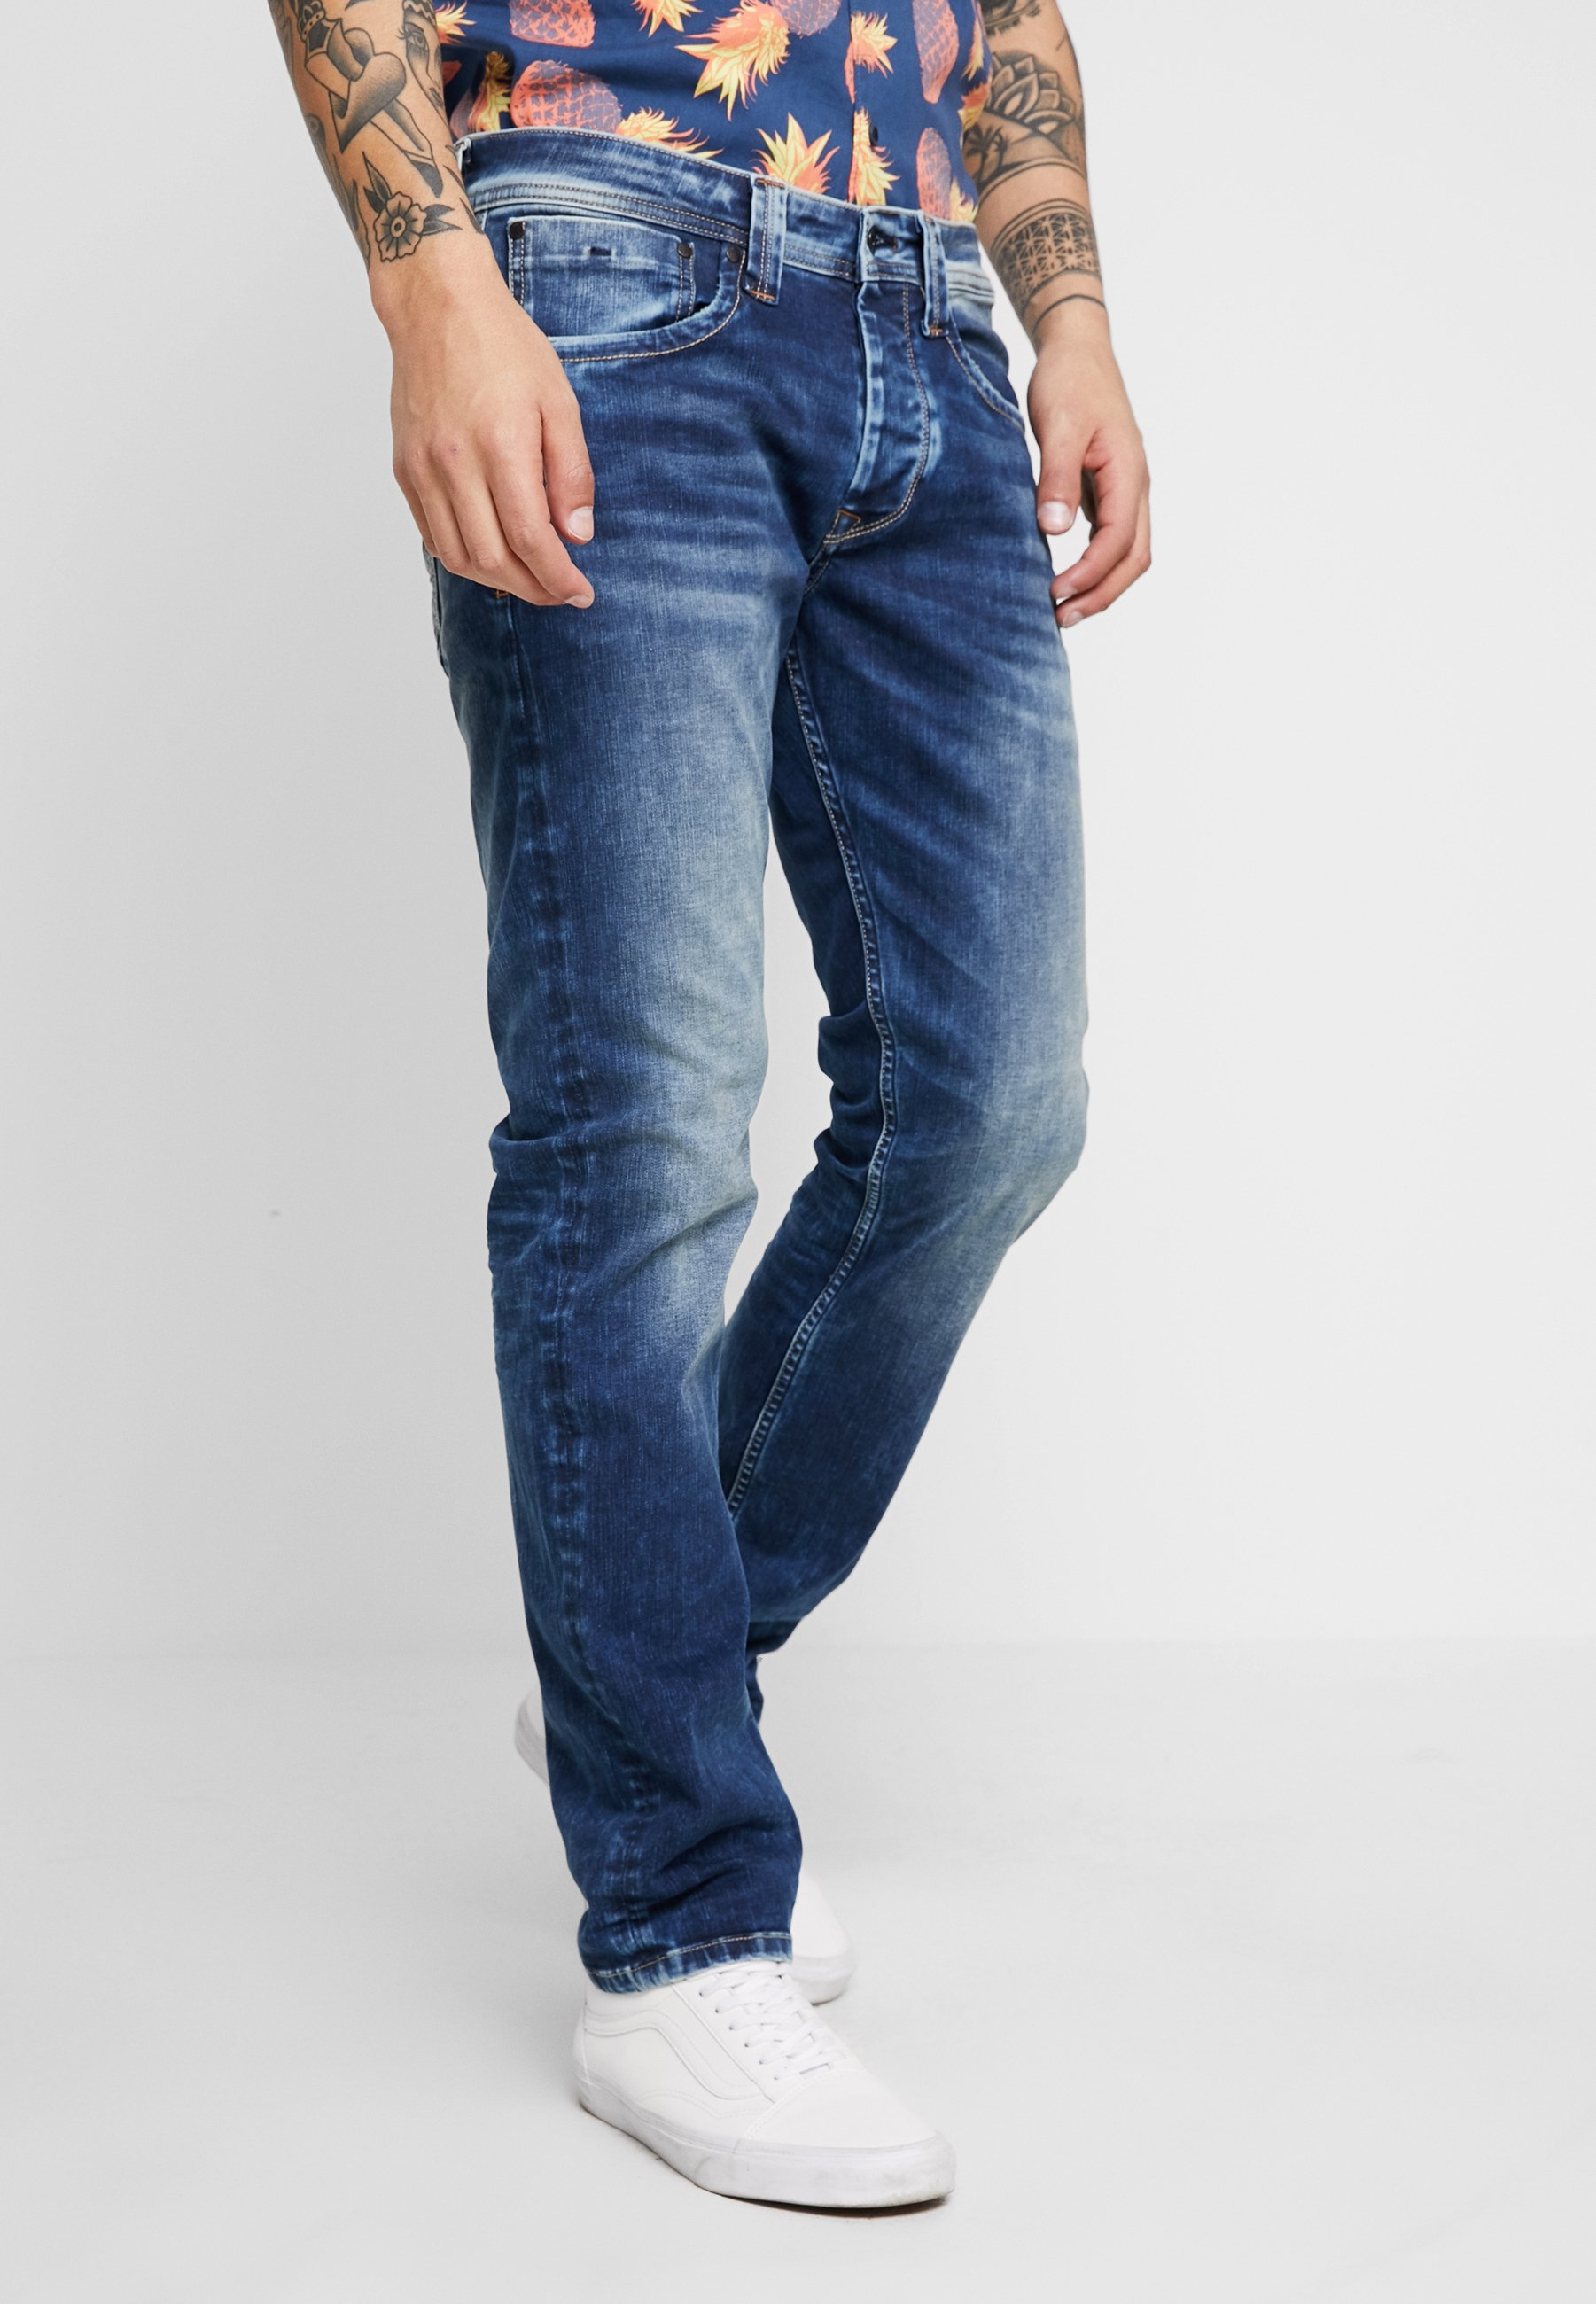 Pepe Used Droit CashJean Medium Jeans Powerflex 7bf6gYy